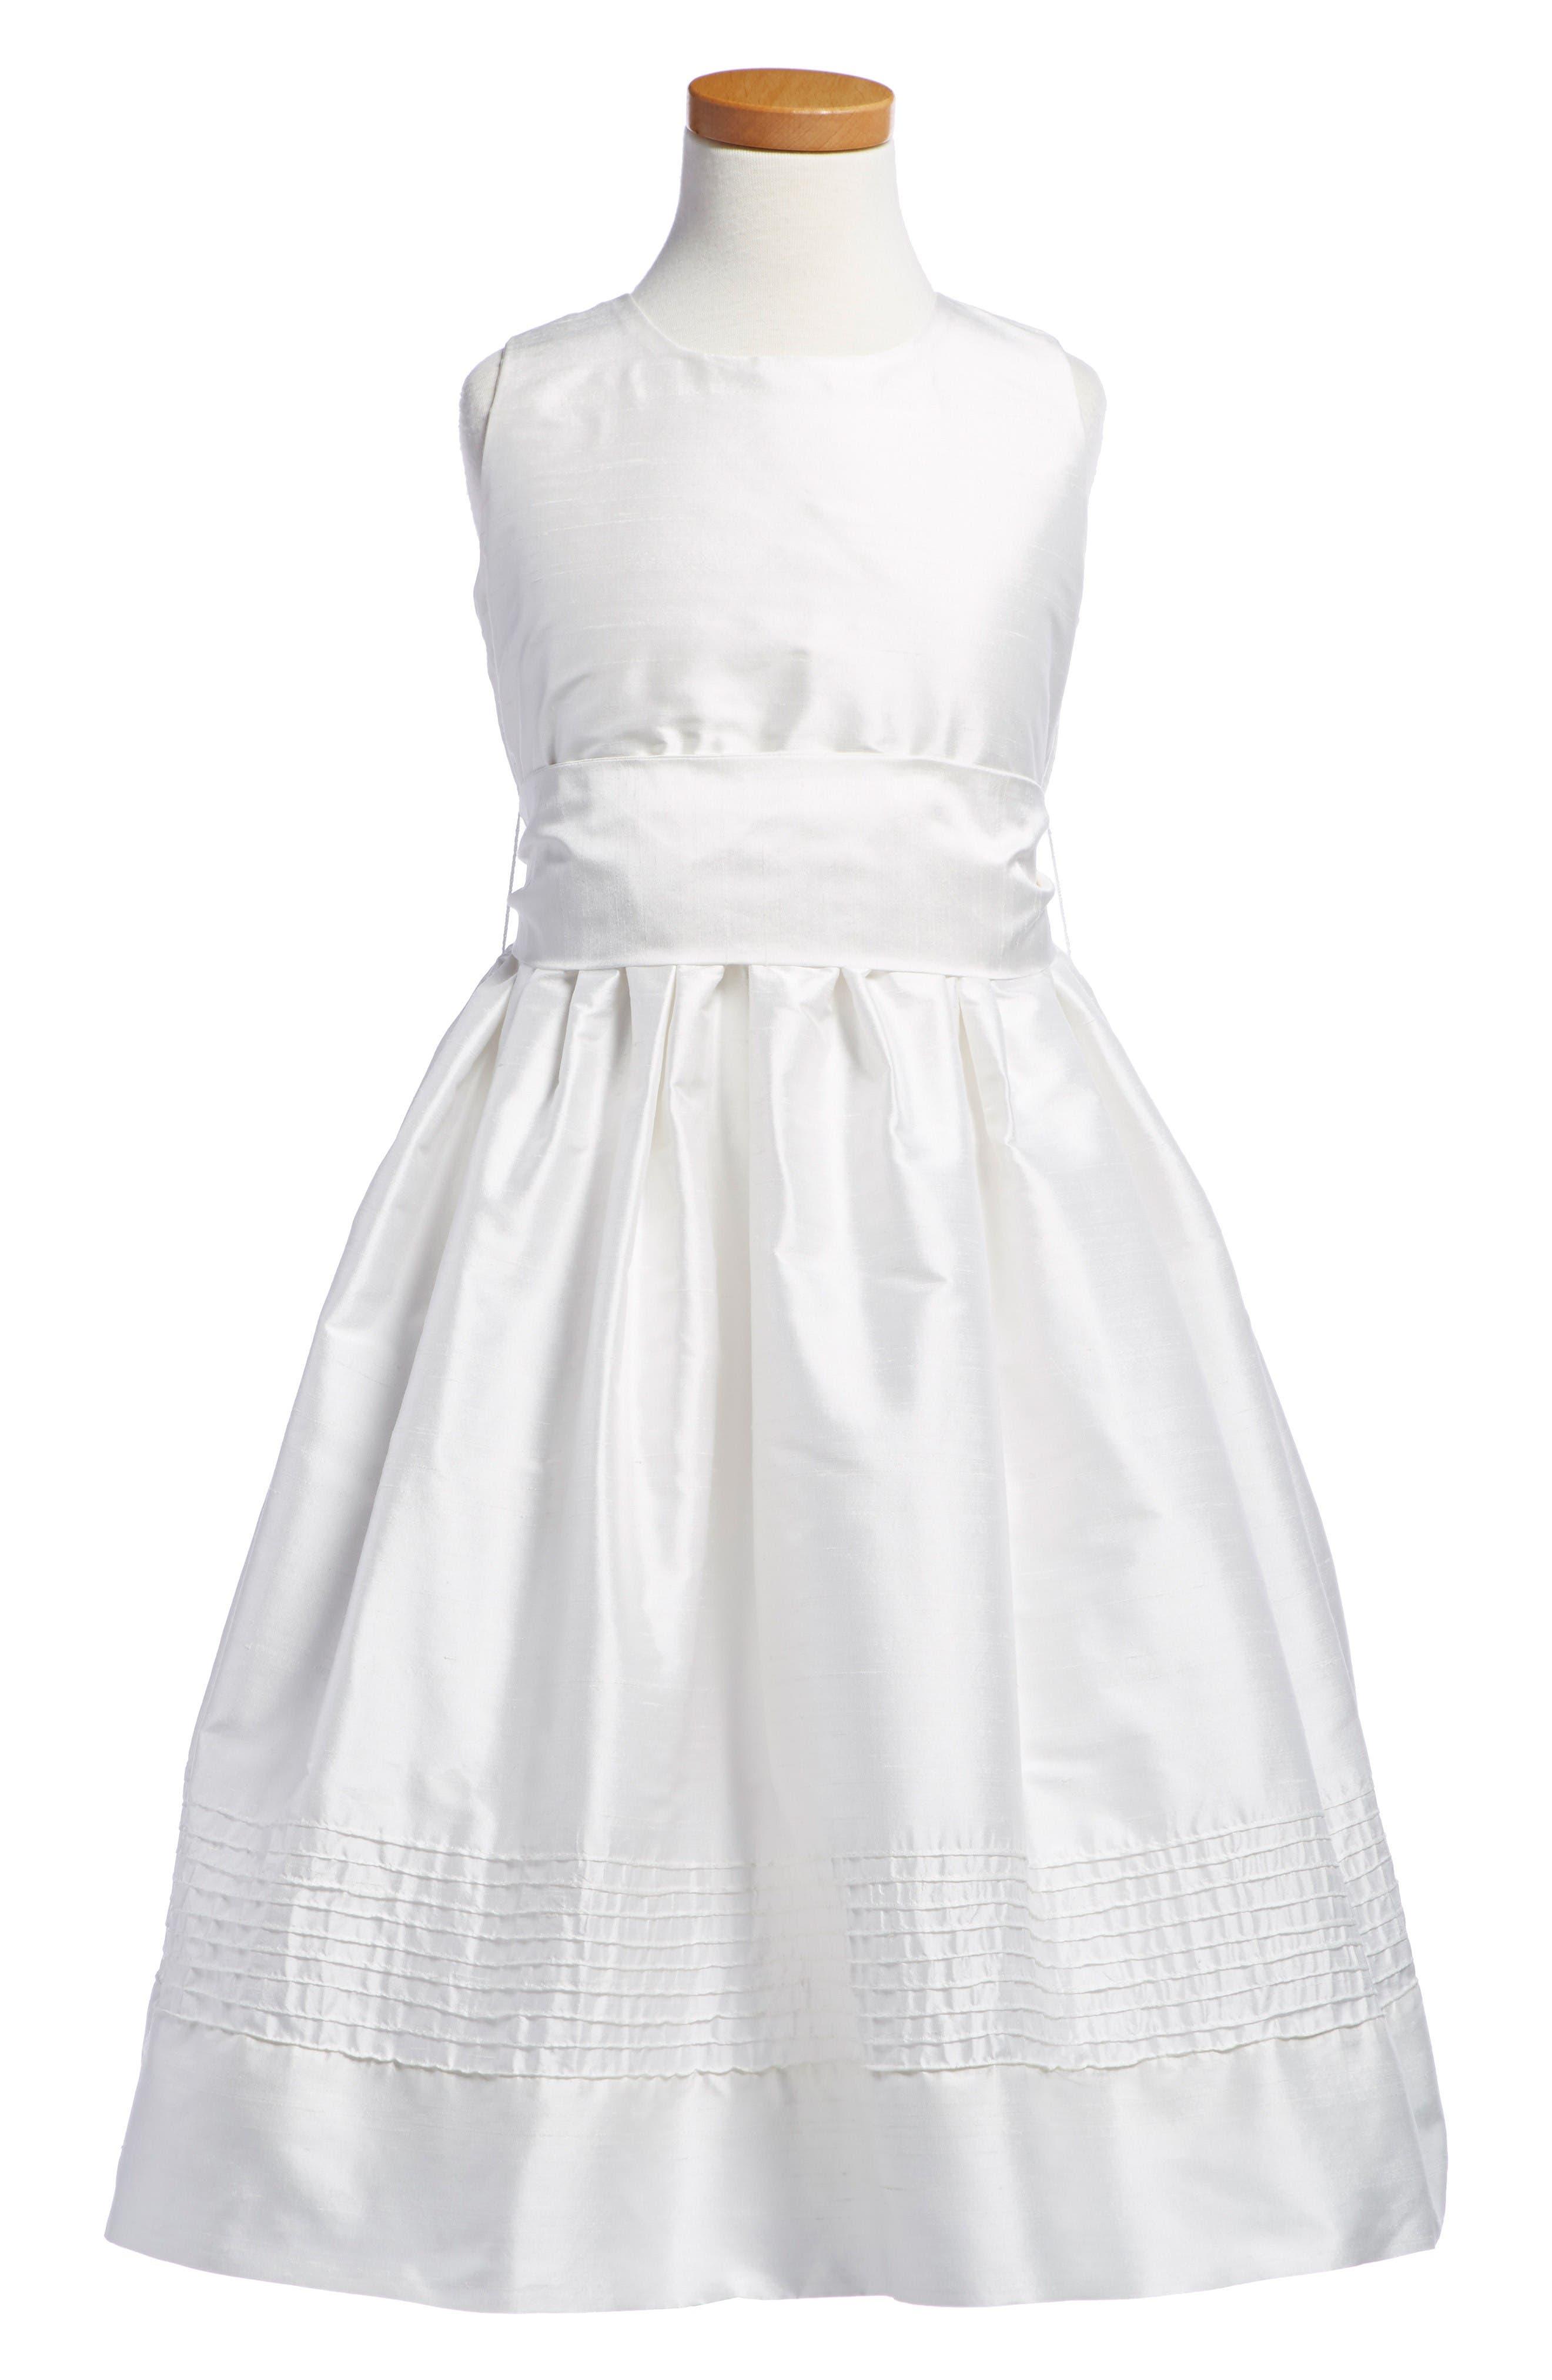 'Timeless' Sleeveless Dress,                             Main thumbnail 1, color,                             105